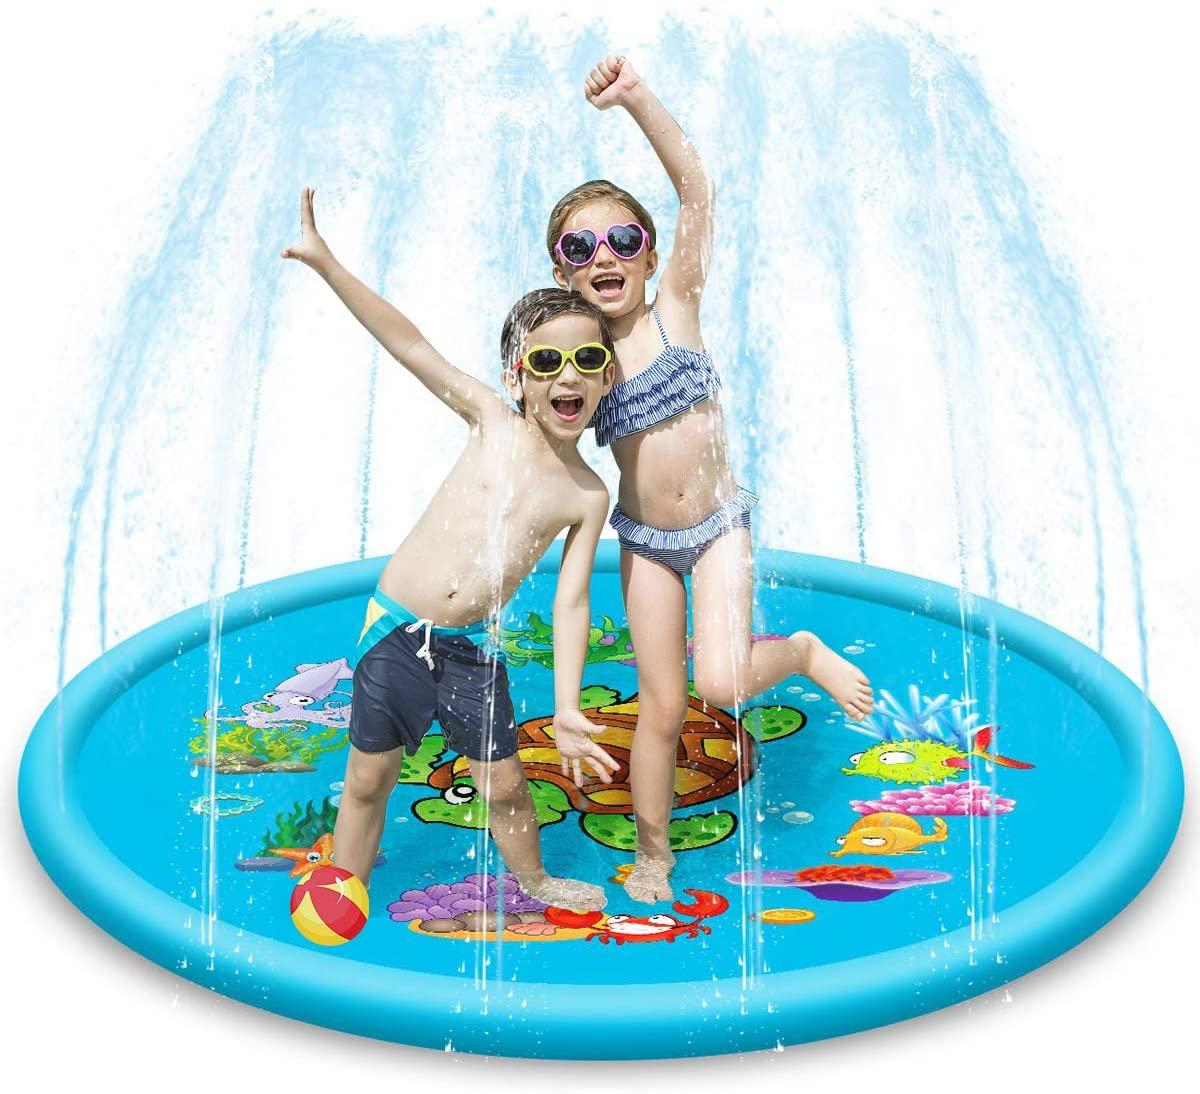 DaMohony Kid Sprinkler Pad Splash Water Play Mat Outdoor Inflatable Toddler Fountain